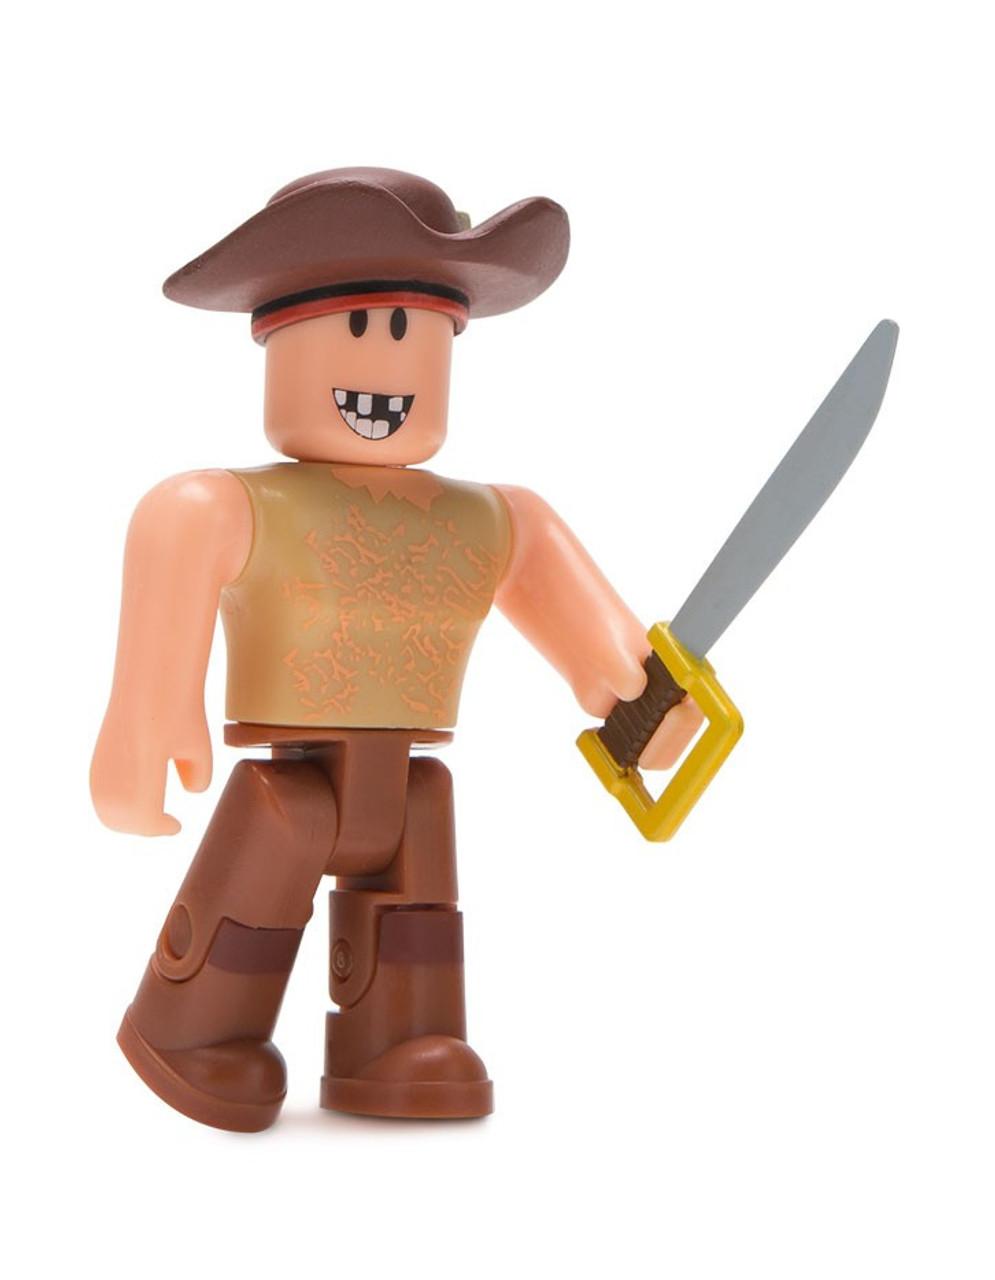 Roblox Buck Eye The Pirate 3 Mini Figure No Code Loose Jazwares